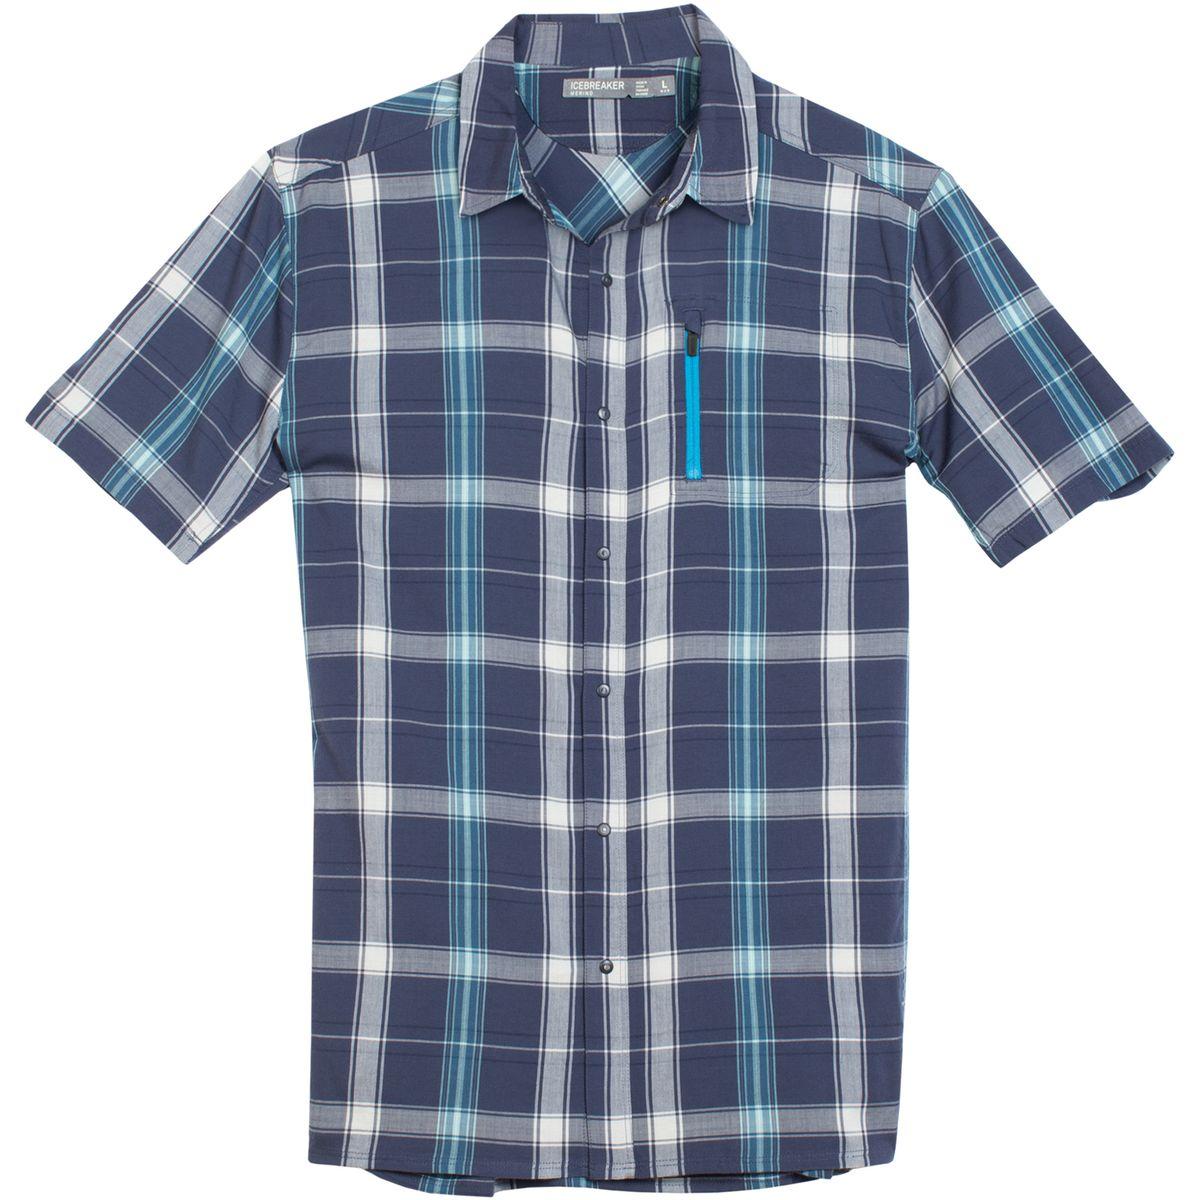 Icebreaker Compass II Plaid Shirt - Men